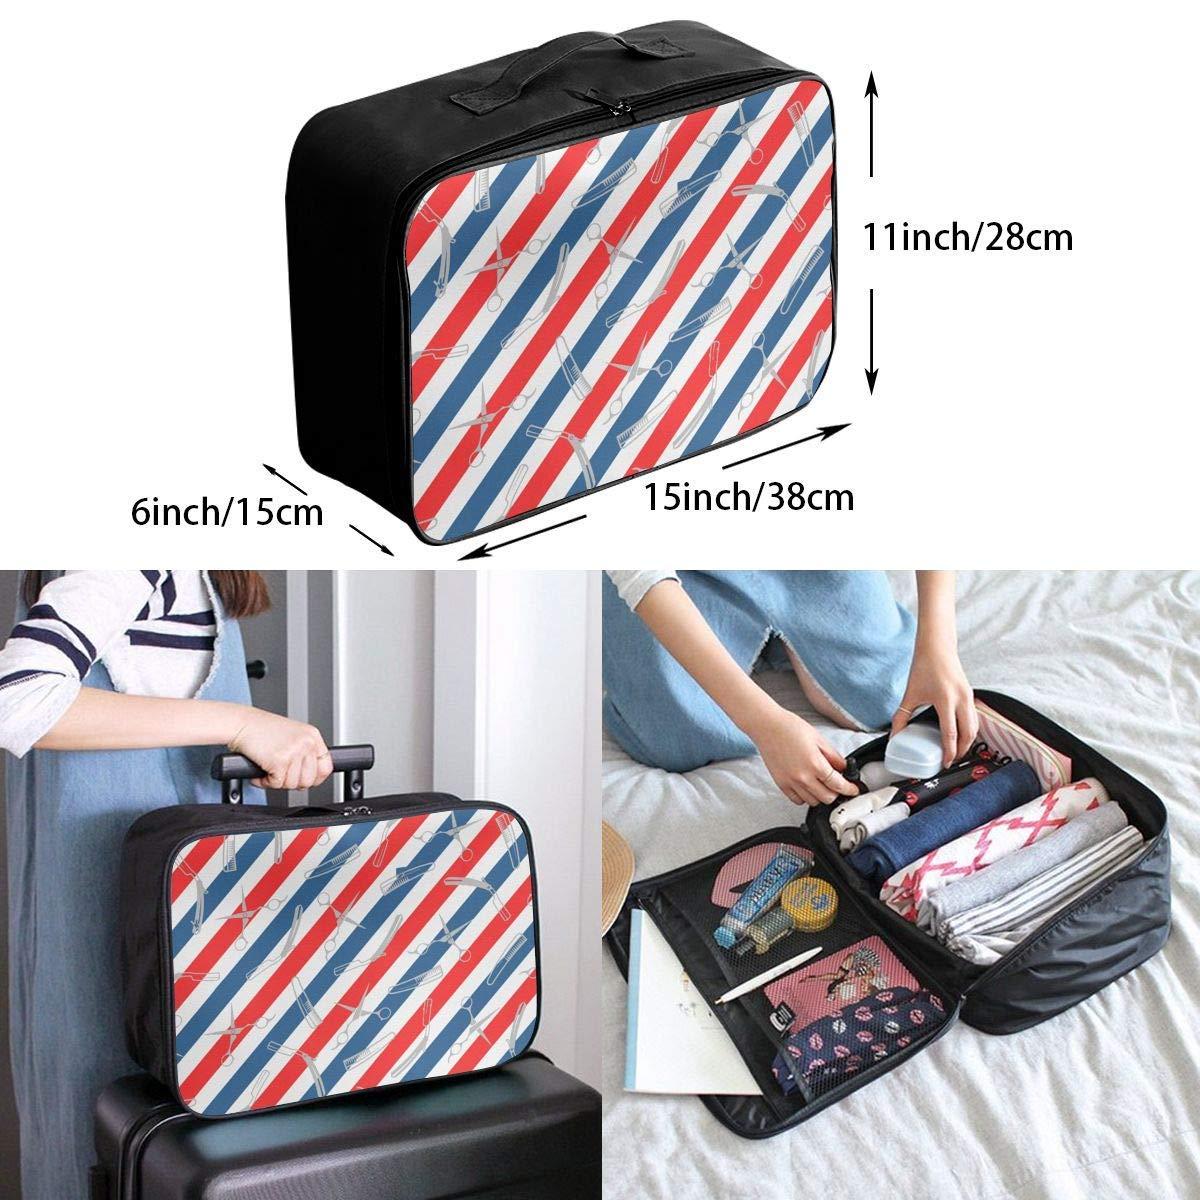 Barber Us Flag Stripes Travel Duffel Bag Waterproof Fashion Lightweight Large Capacity Portable Duffel Bag for Men /& Women JTRVW Luggage Bags for Travel